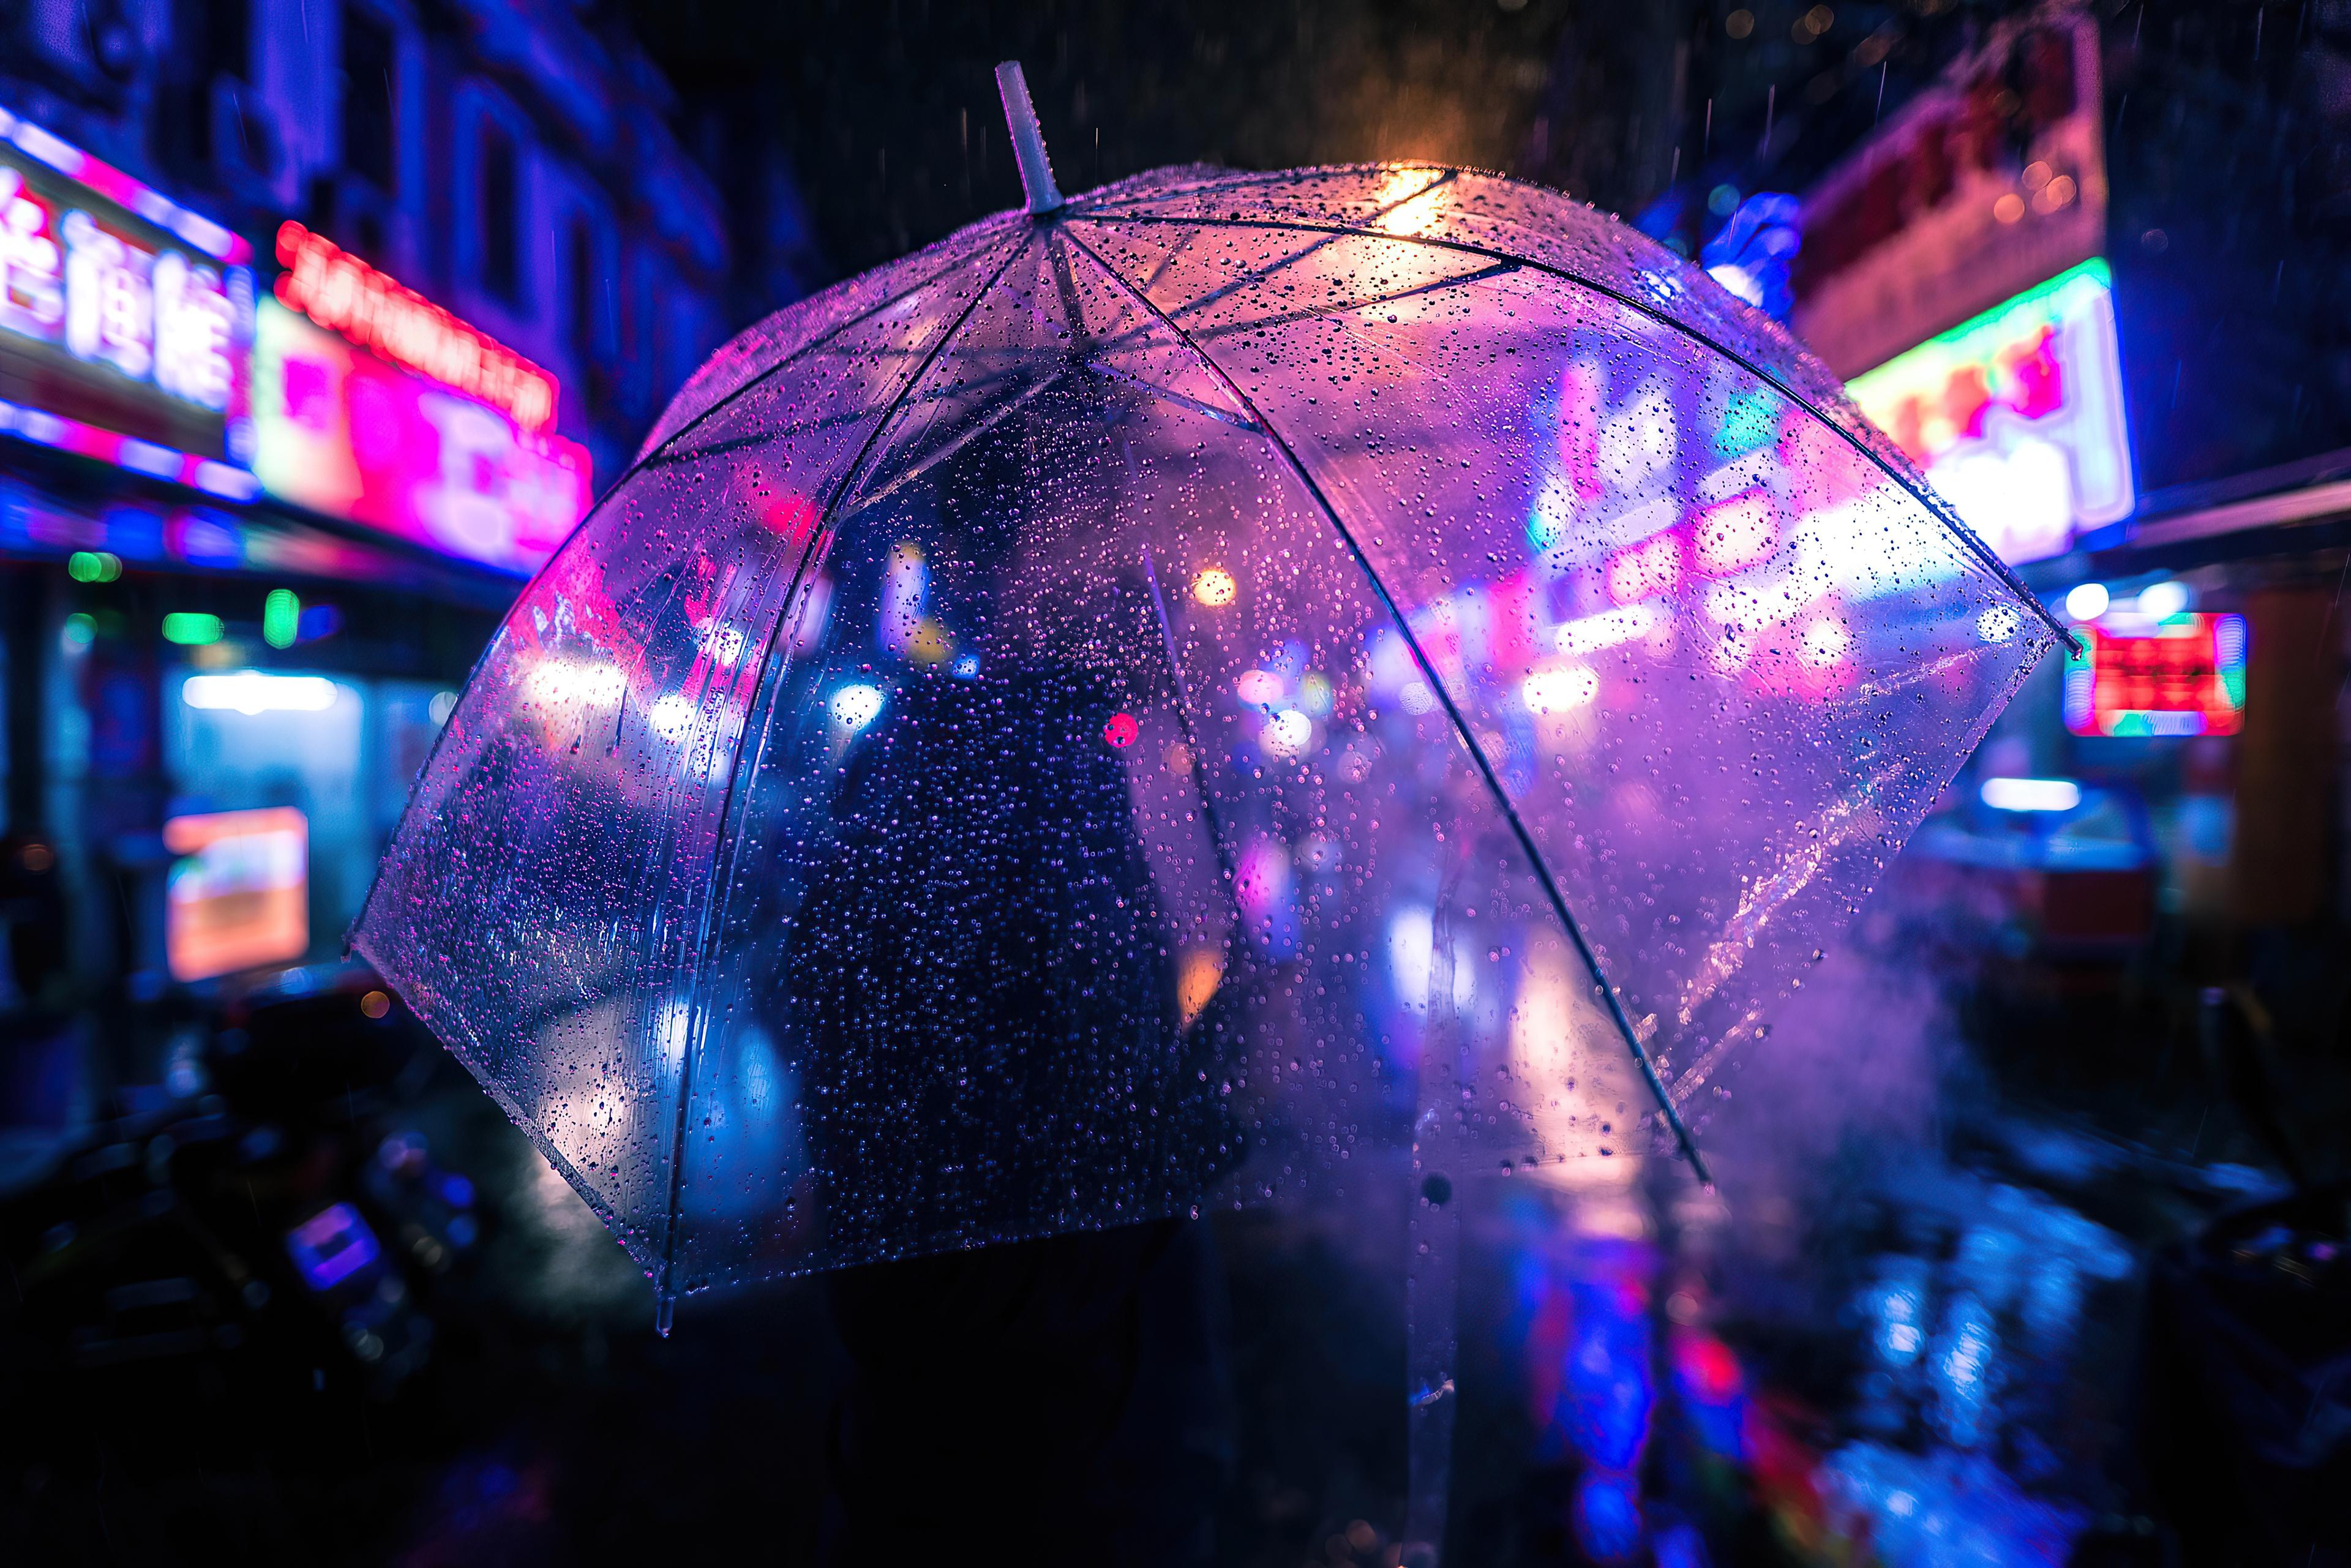 closeup umbrella neon night photography 4k 1616094238 - Closeup Umbrella Neon Night Photography 4k - Closeup Umbrella Neon Night Photography 4k wallpapers